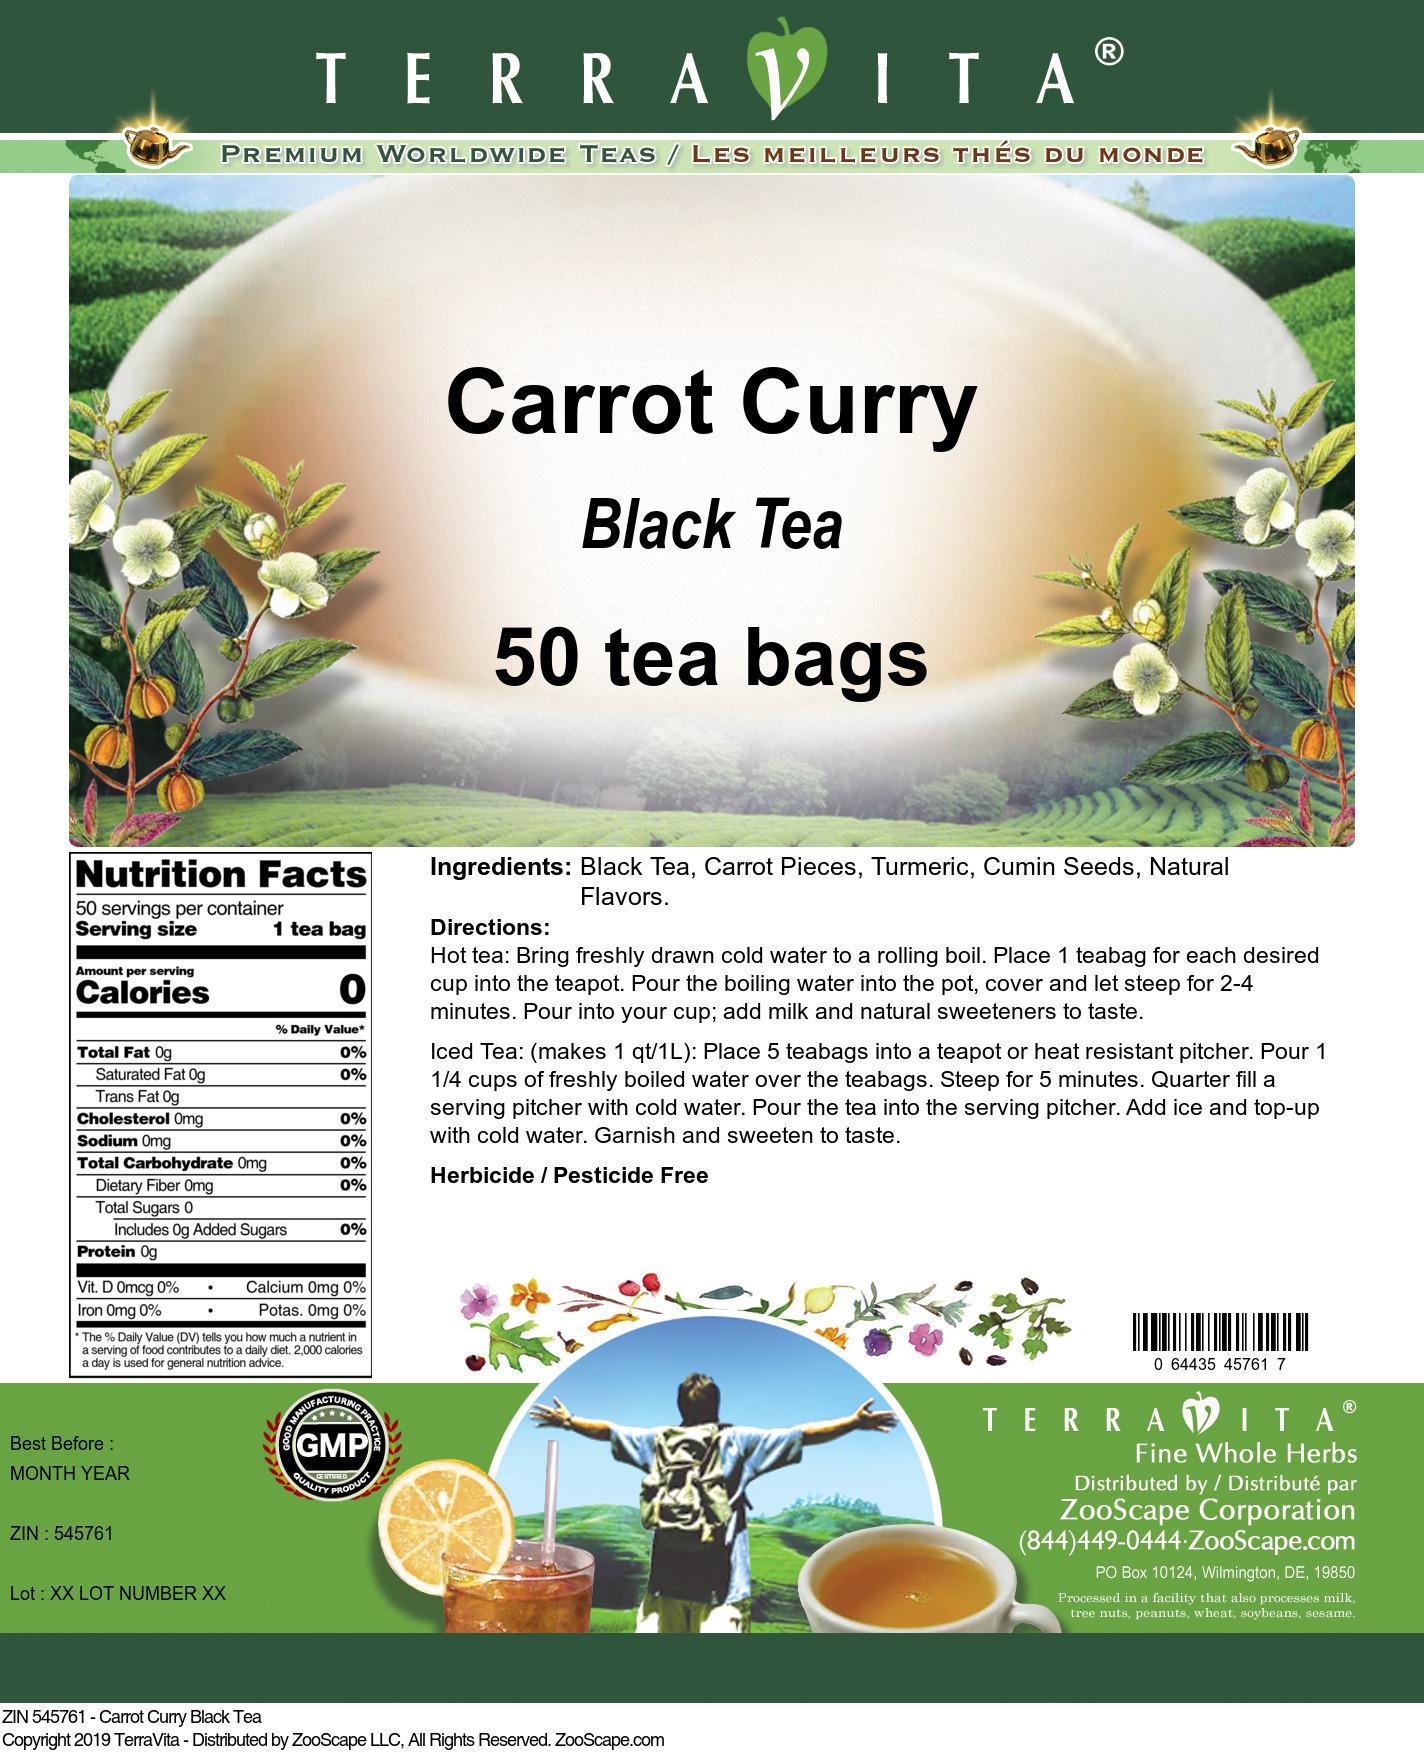 Carrot Curry Black Tea